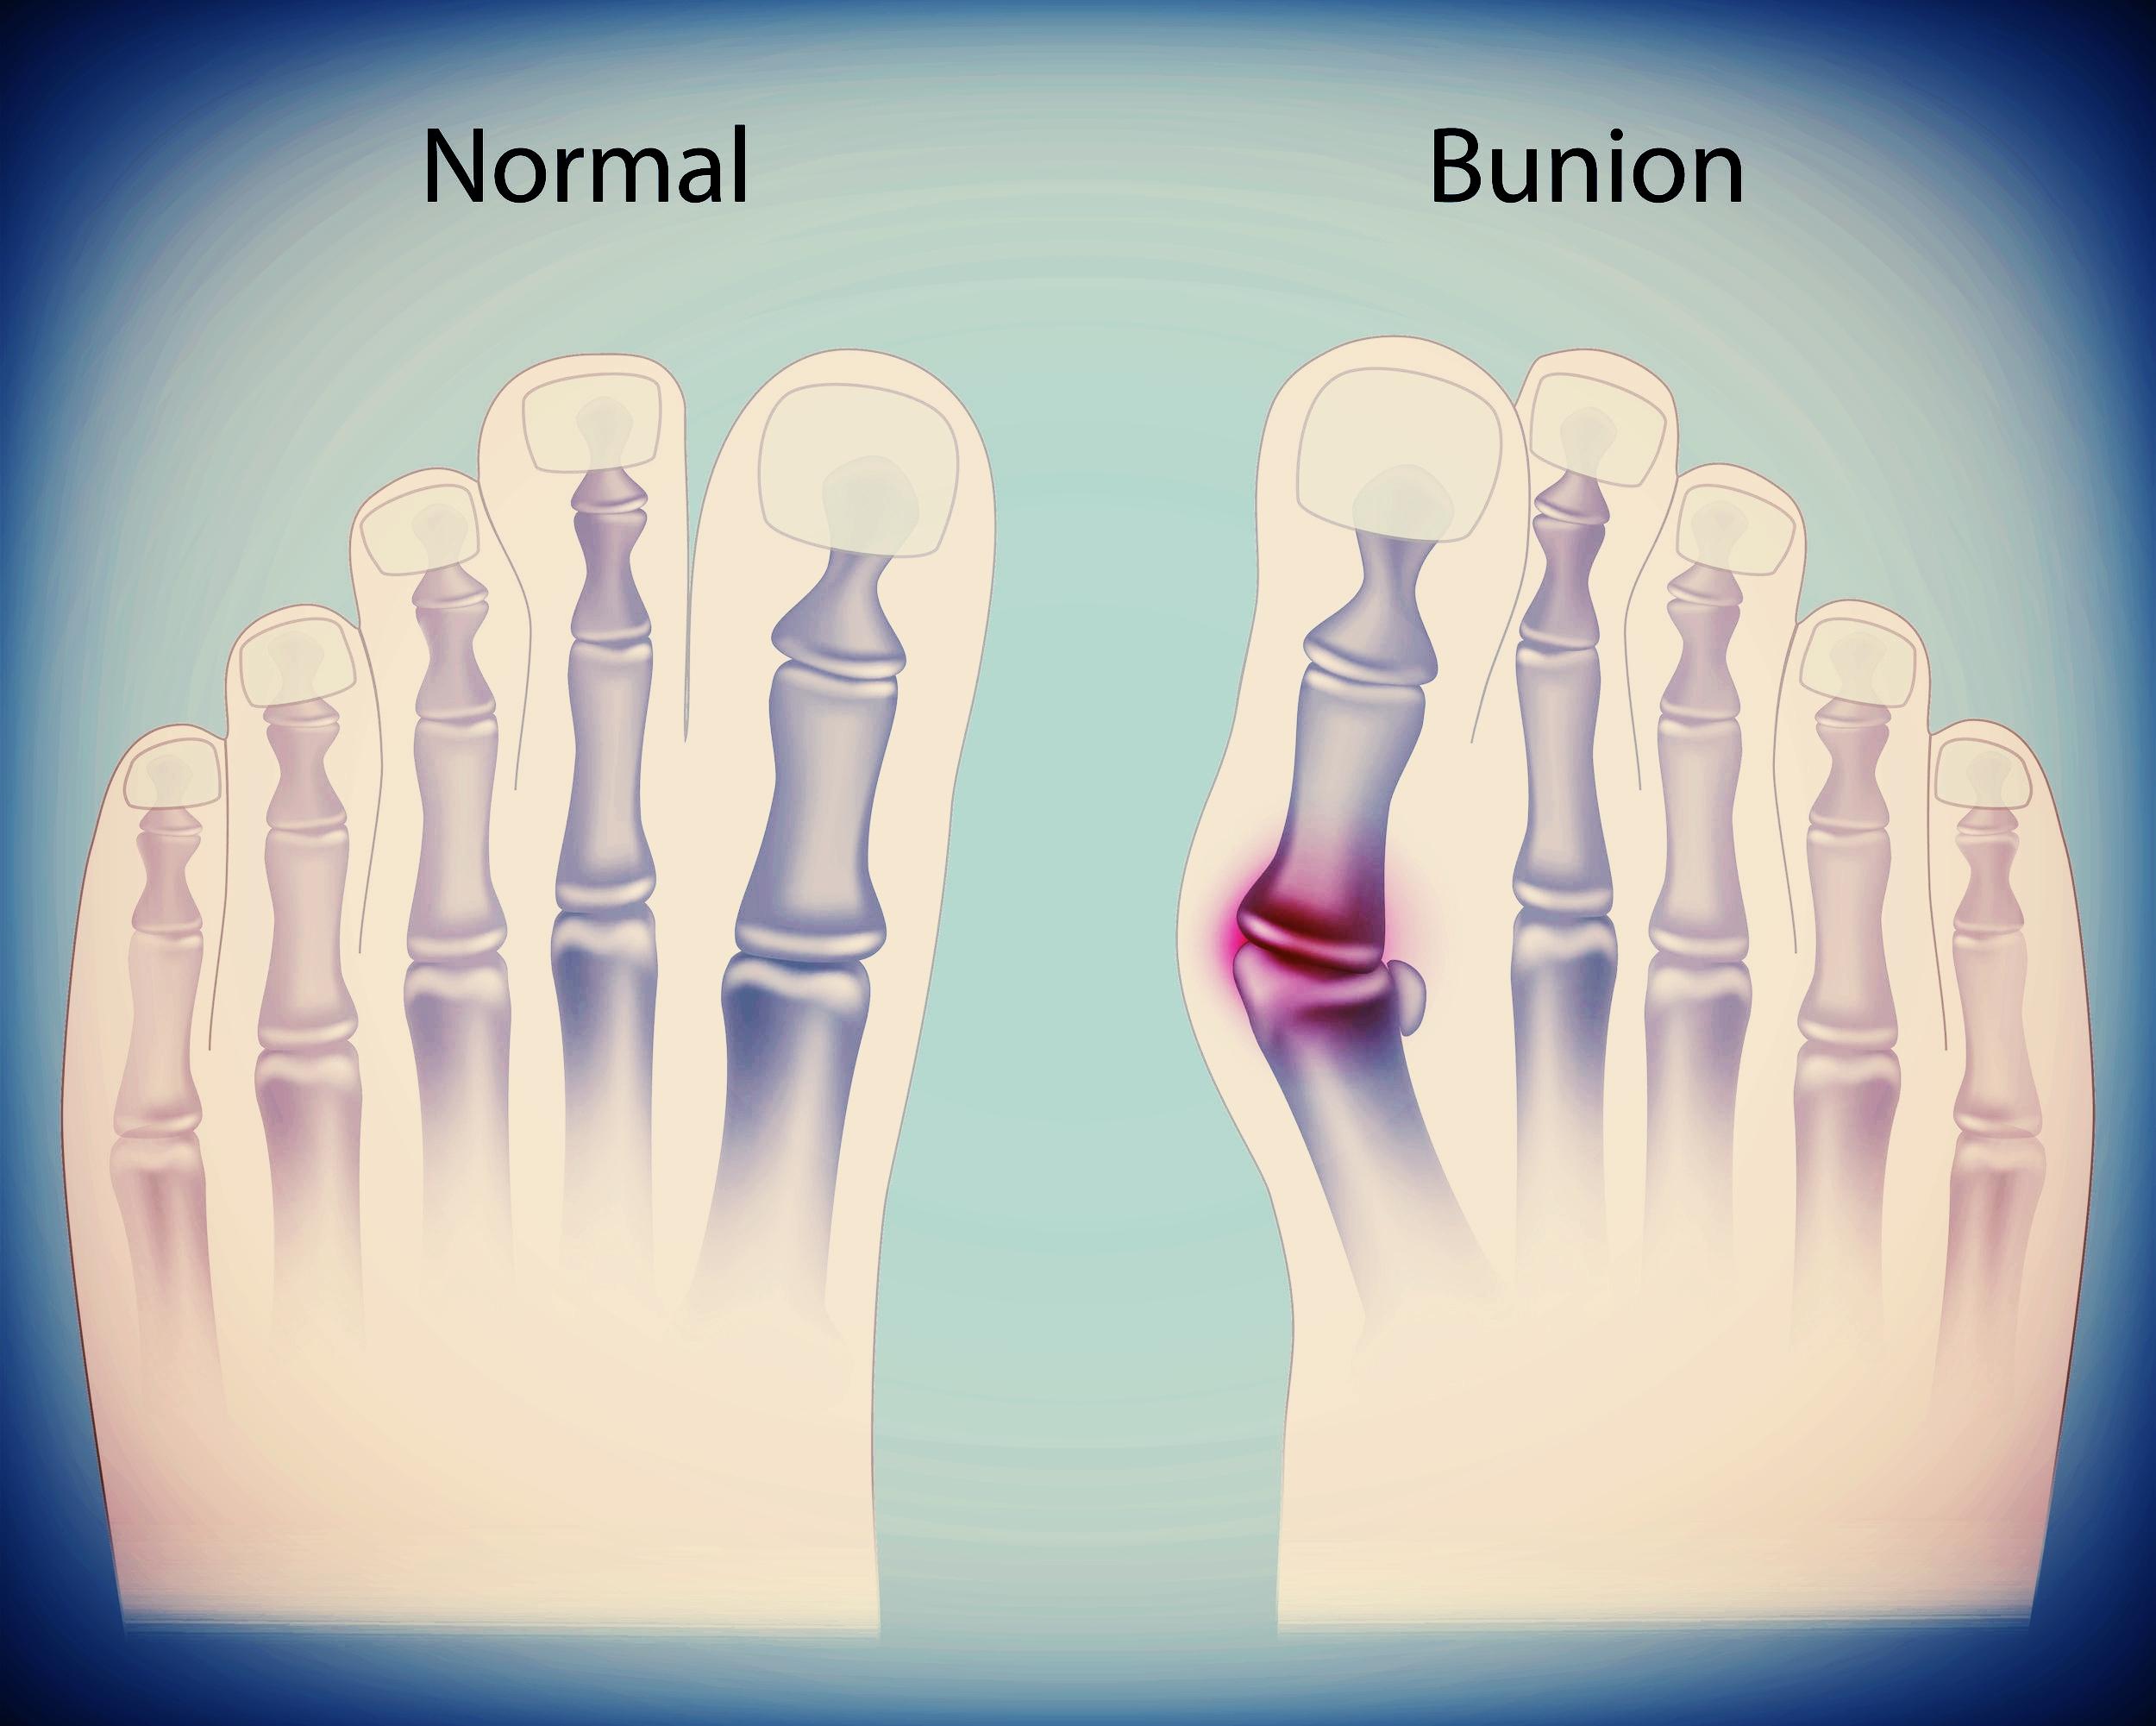 bunion pain relief and correction - bunion specialist podiatrist ross cohen serving glen burnie, md